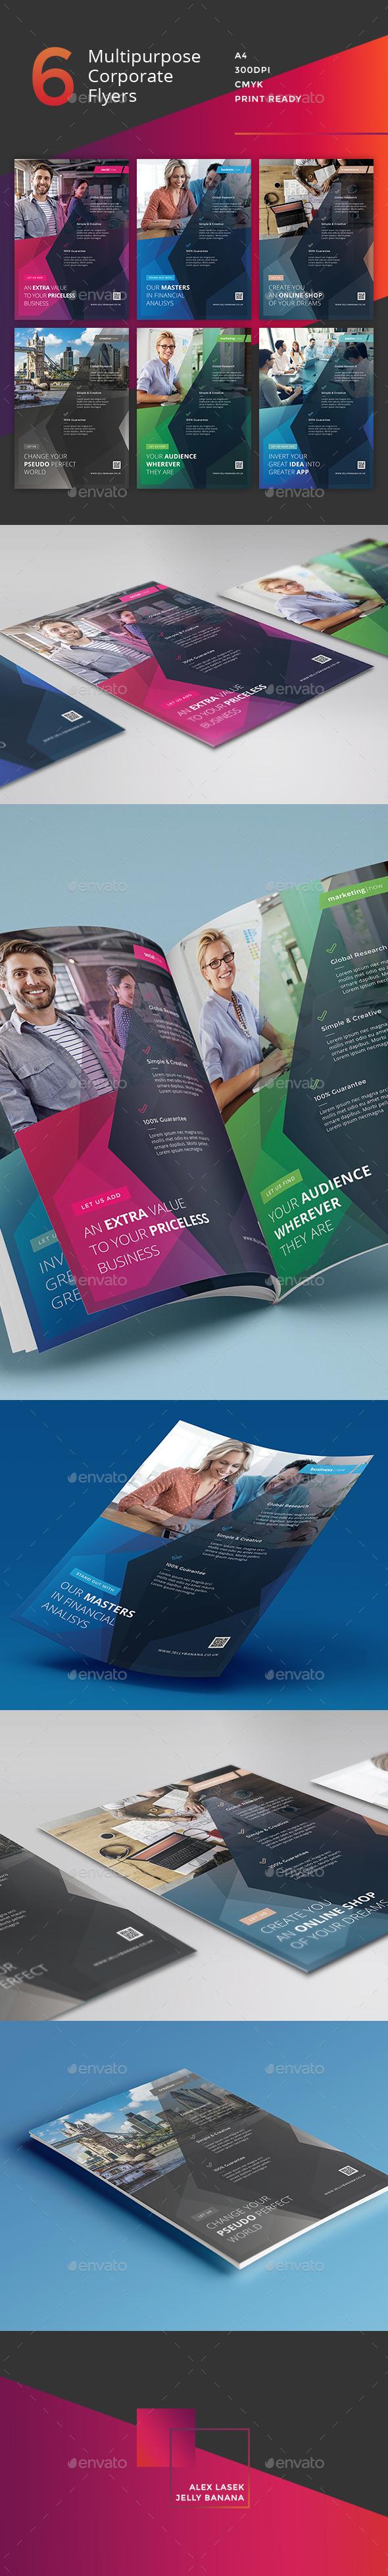 Corporate Flyer - 6 Multipurpose Business Templates vol 29 - Corporate Flyers